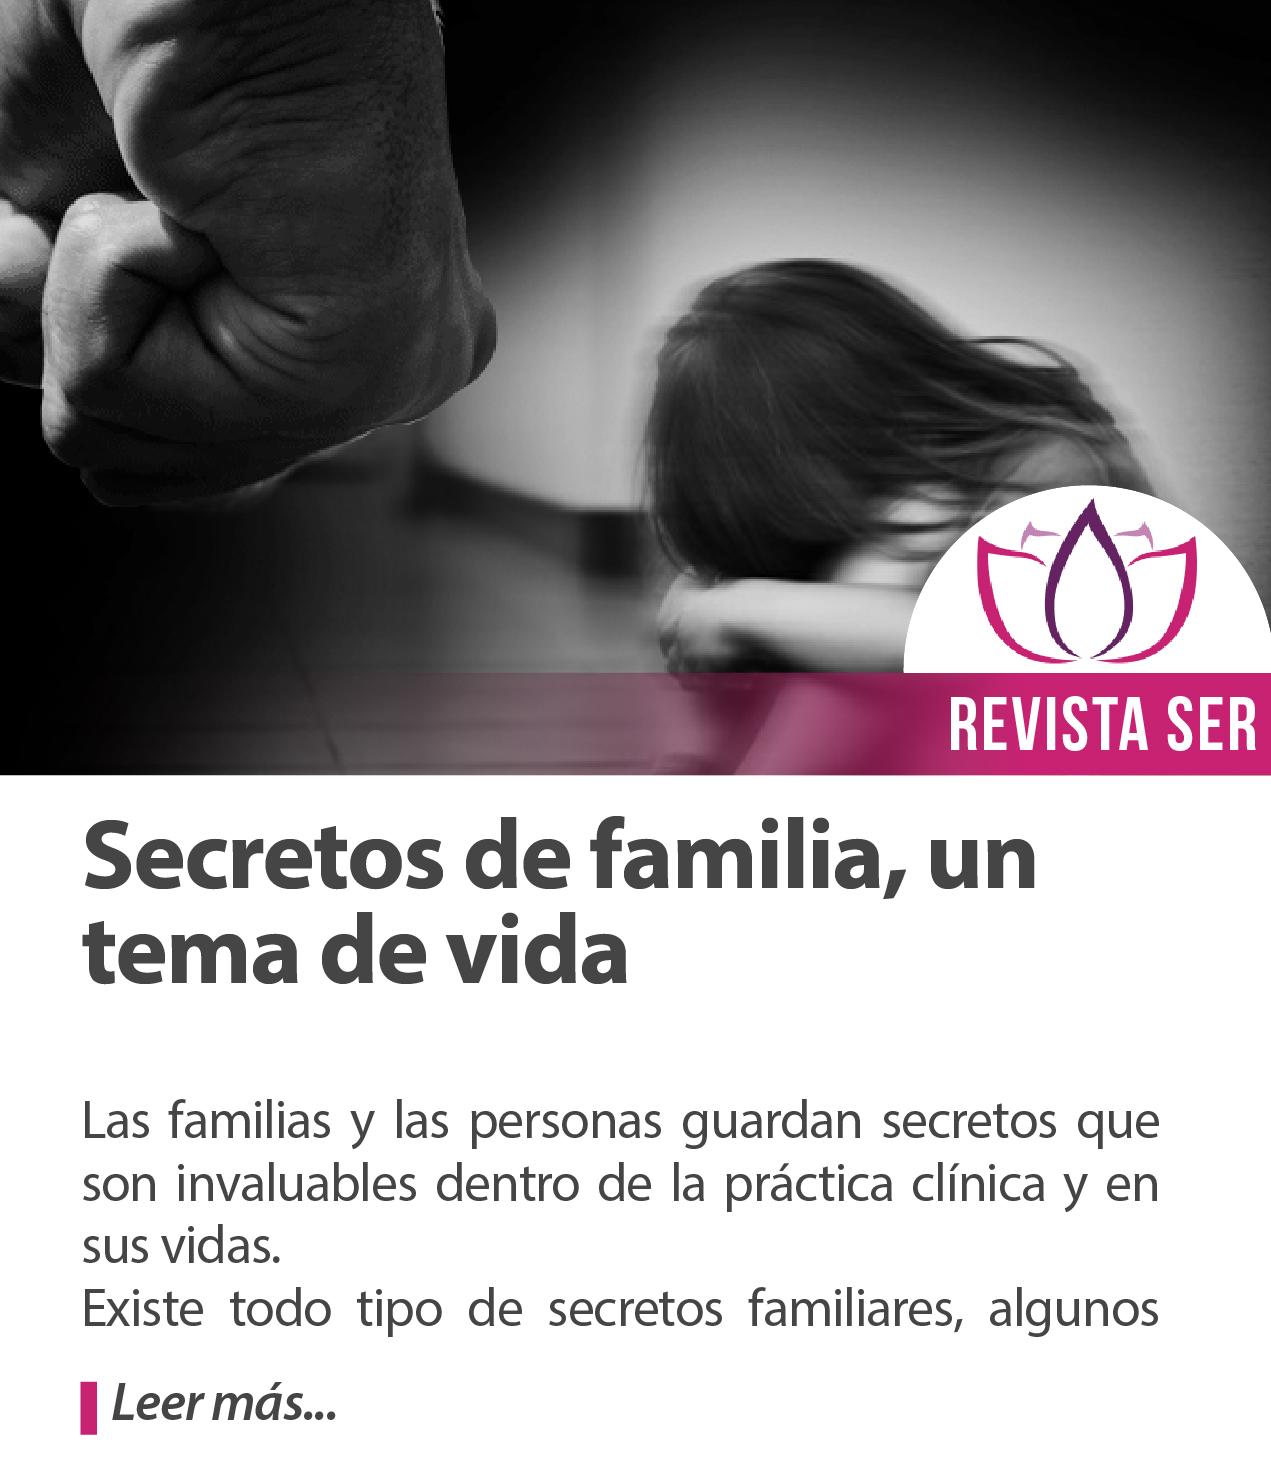 Secretos de familia, un tema de vida